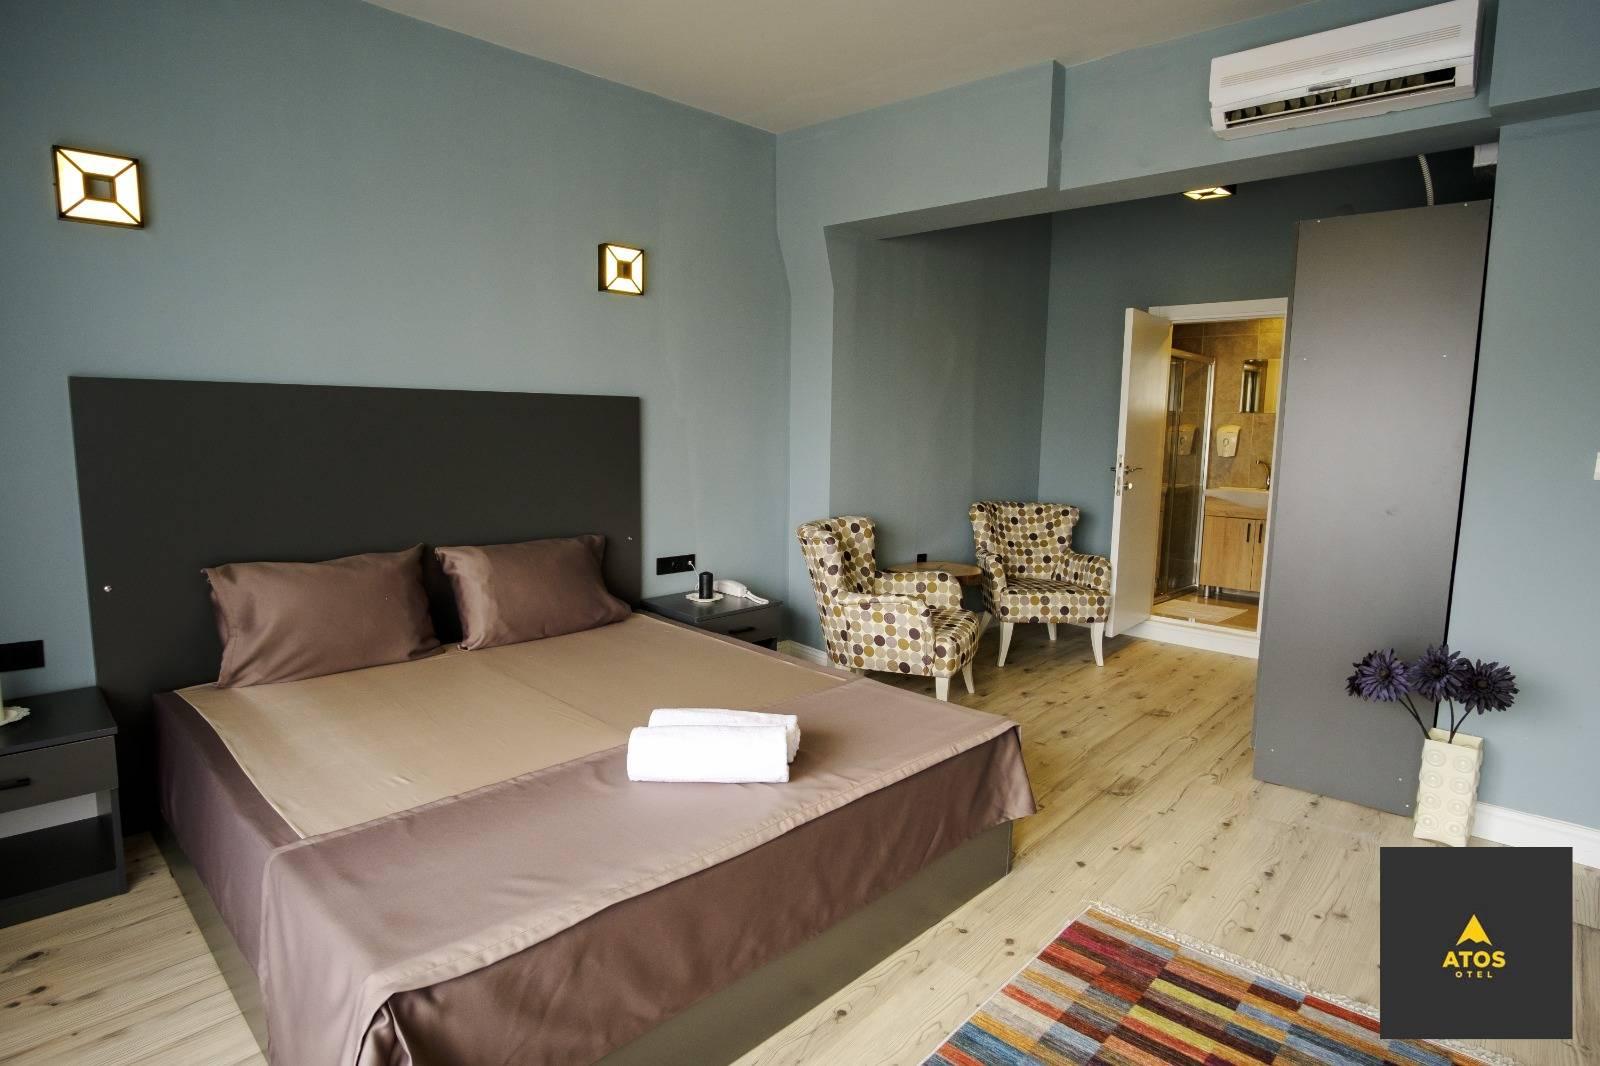 Atos Otel, Eskişehir, Tepebaşı, 36326